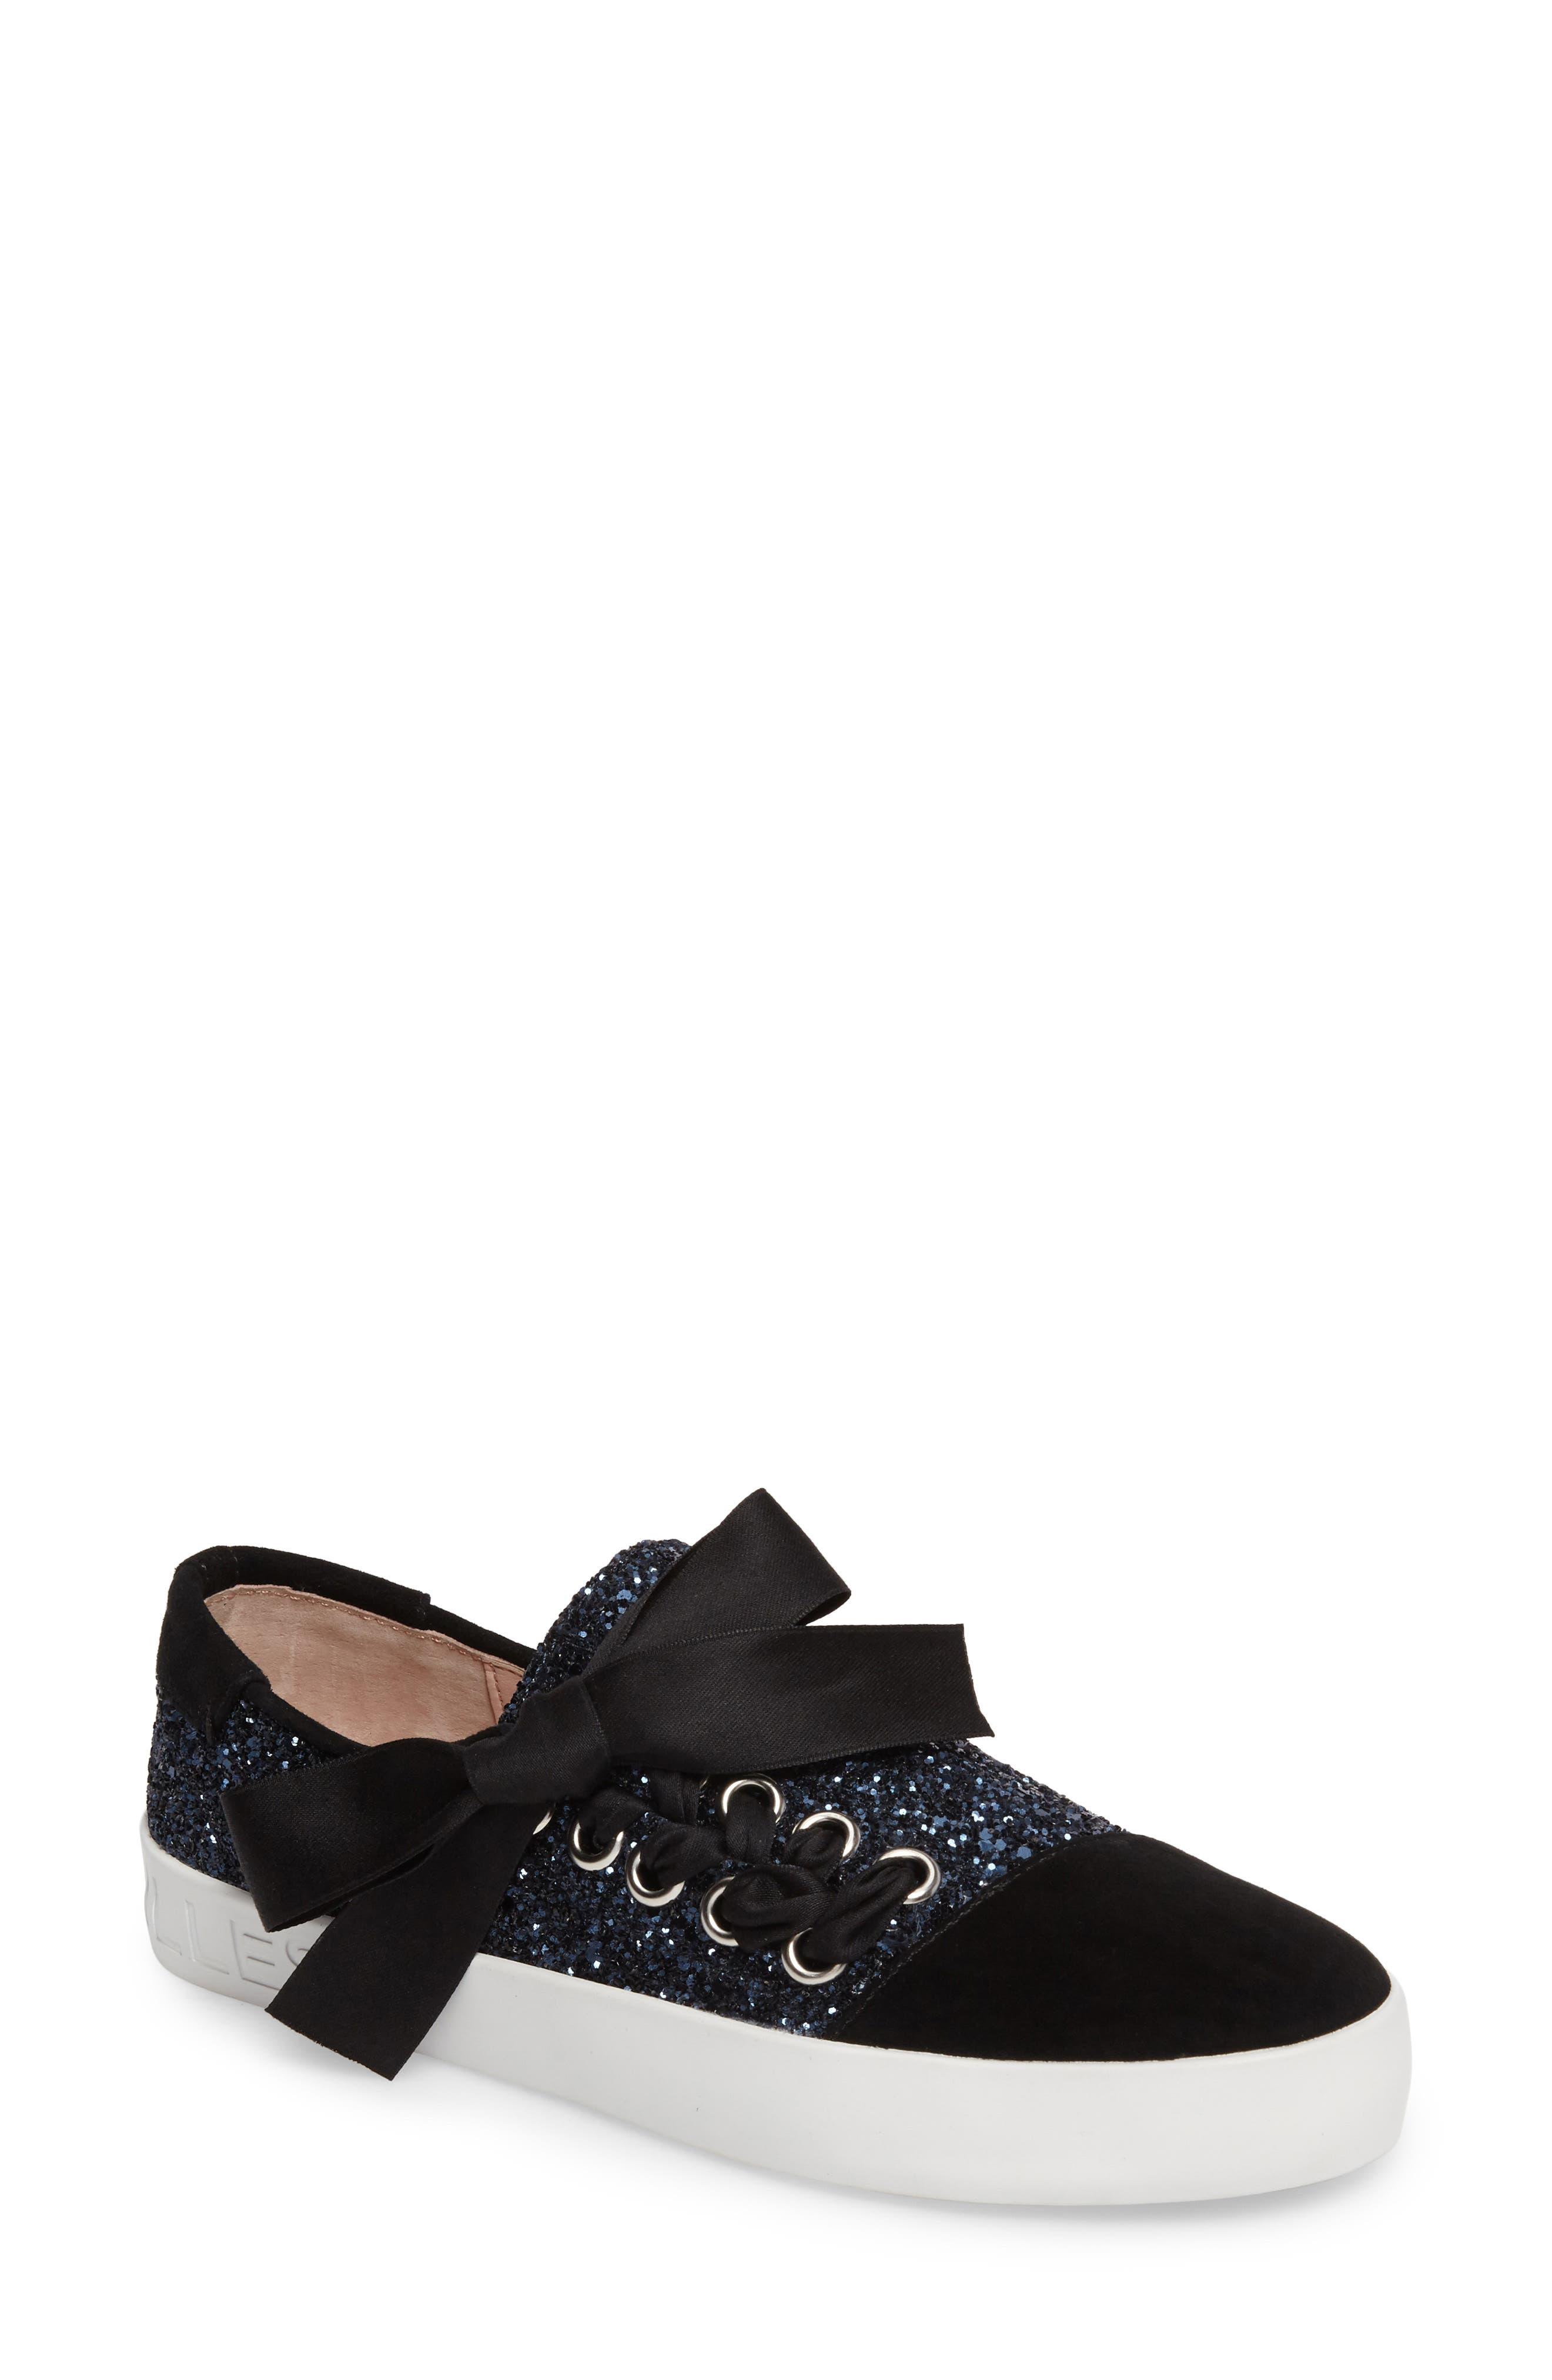 Alternate Image 1 Selected - Avec Les Filles Vera Sneaker (Women)